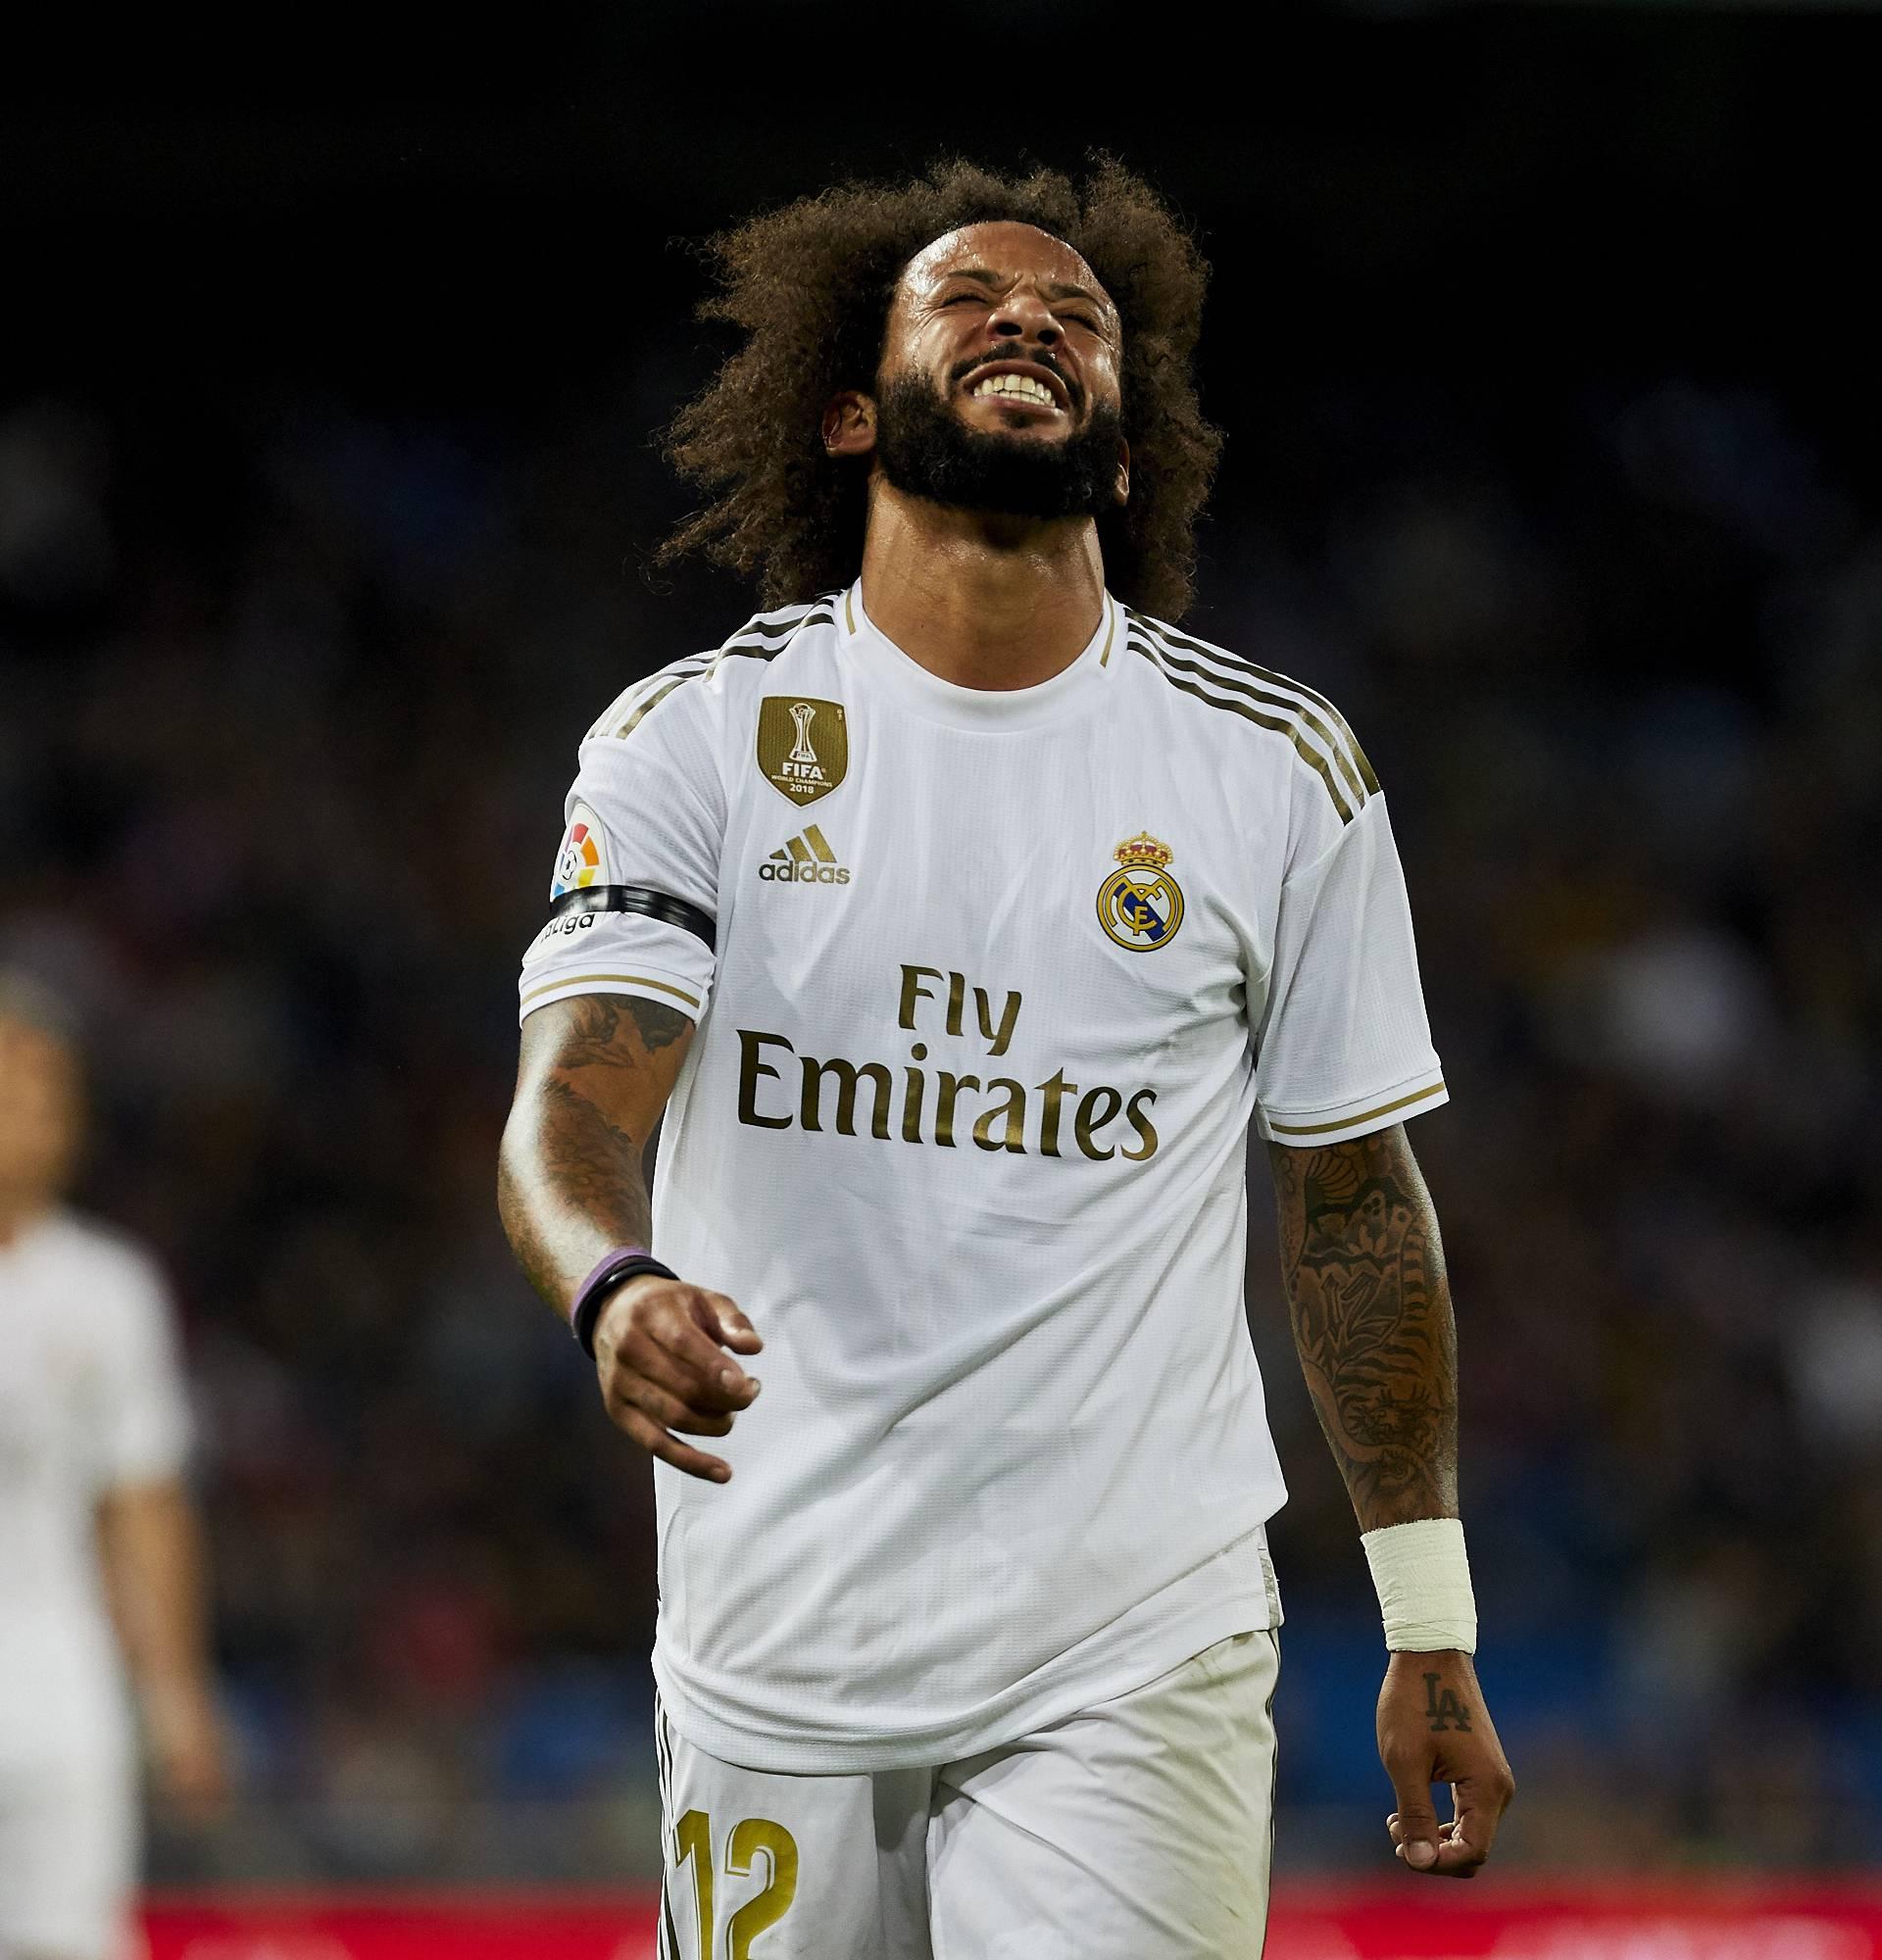 REAL MADRID v CD LEGANES  2019/2020. ROUND 11.